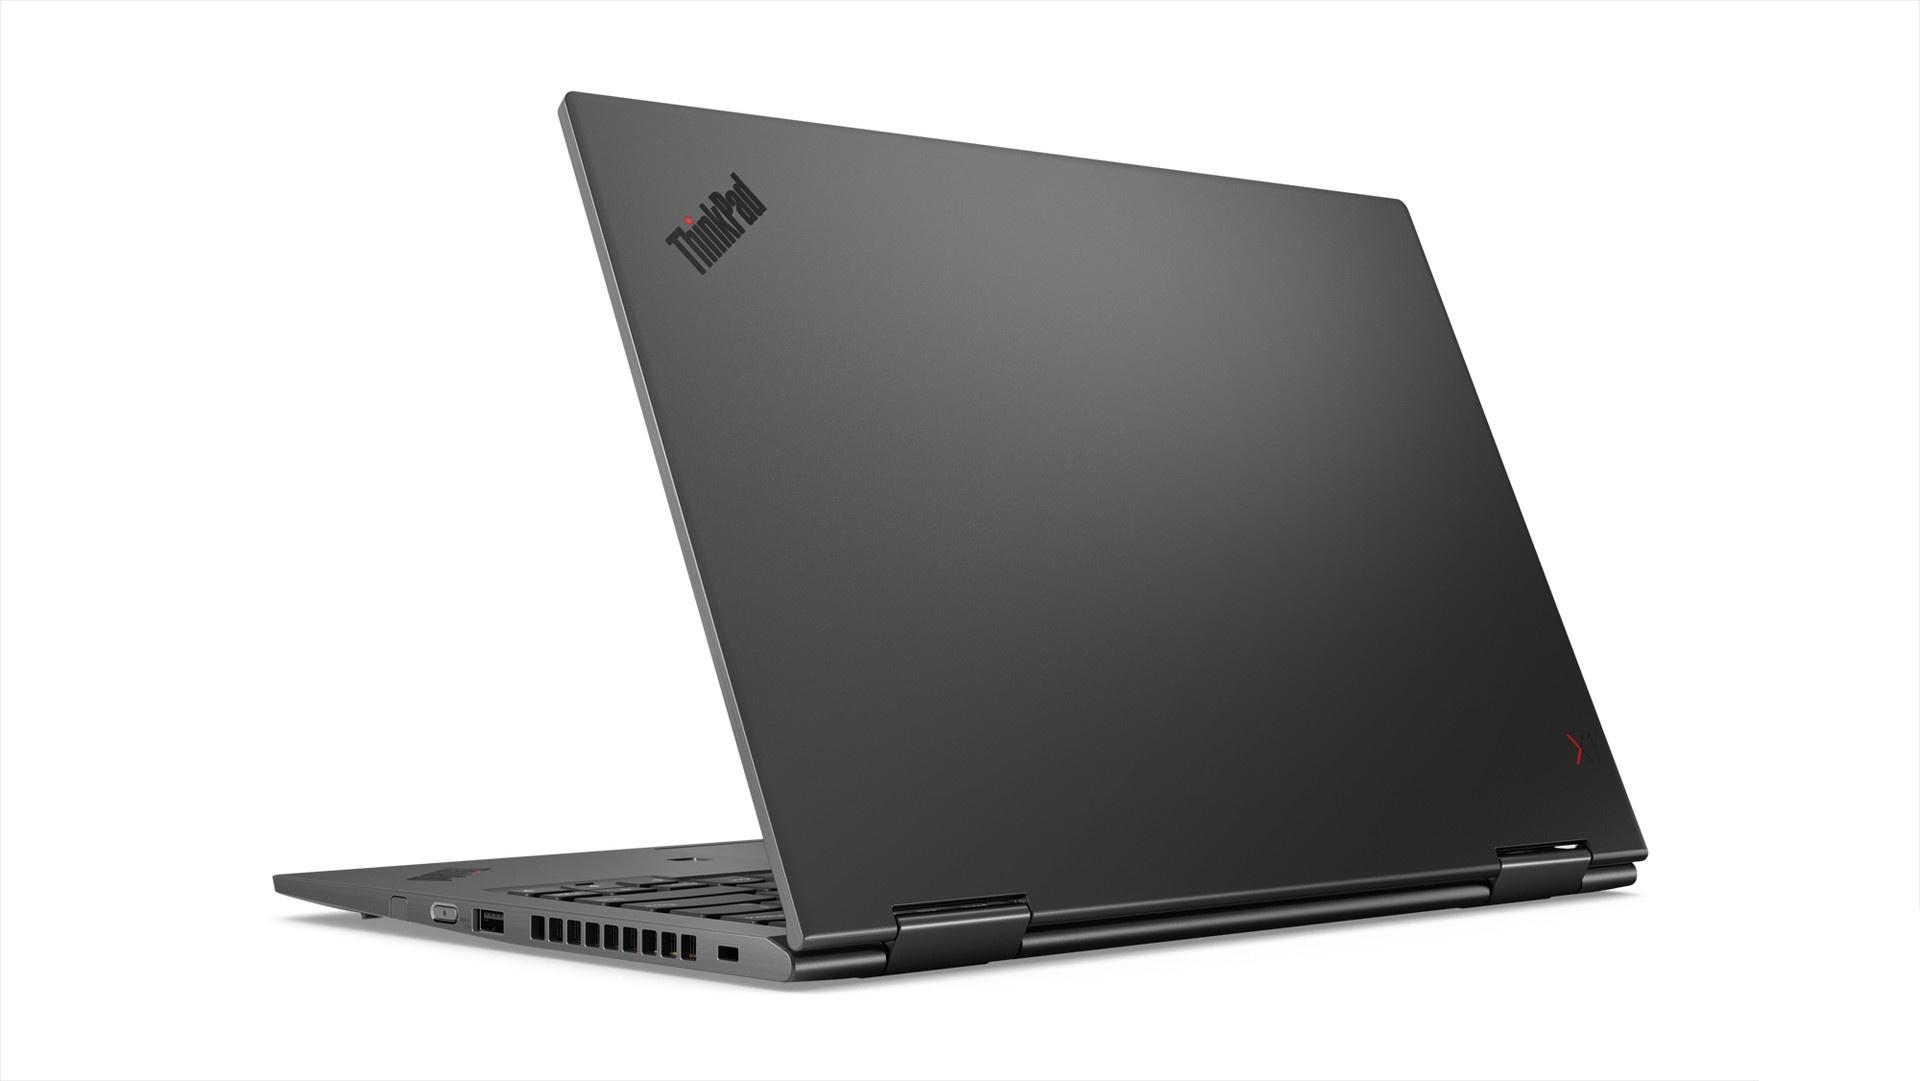 Lenovo ThinkPad X1 Yoga 2019 offiziell vorgestellt mit